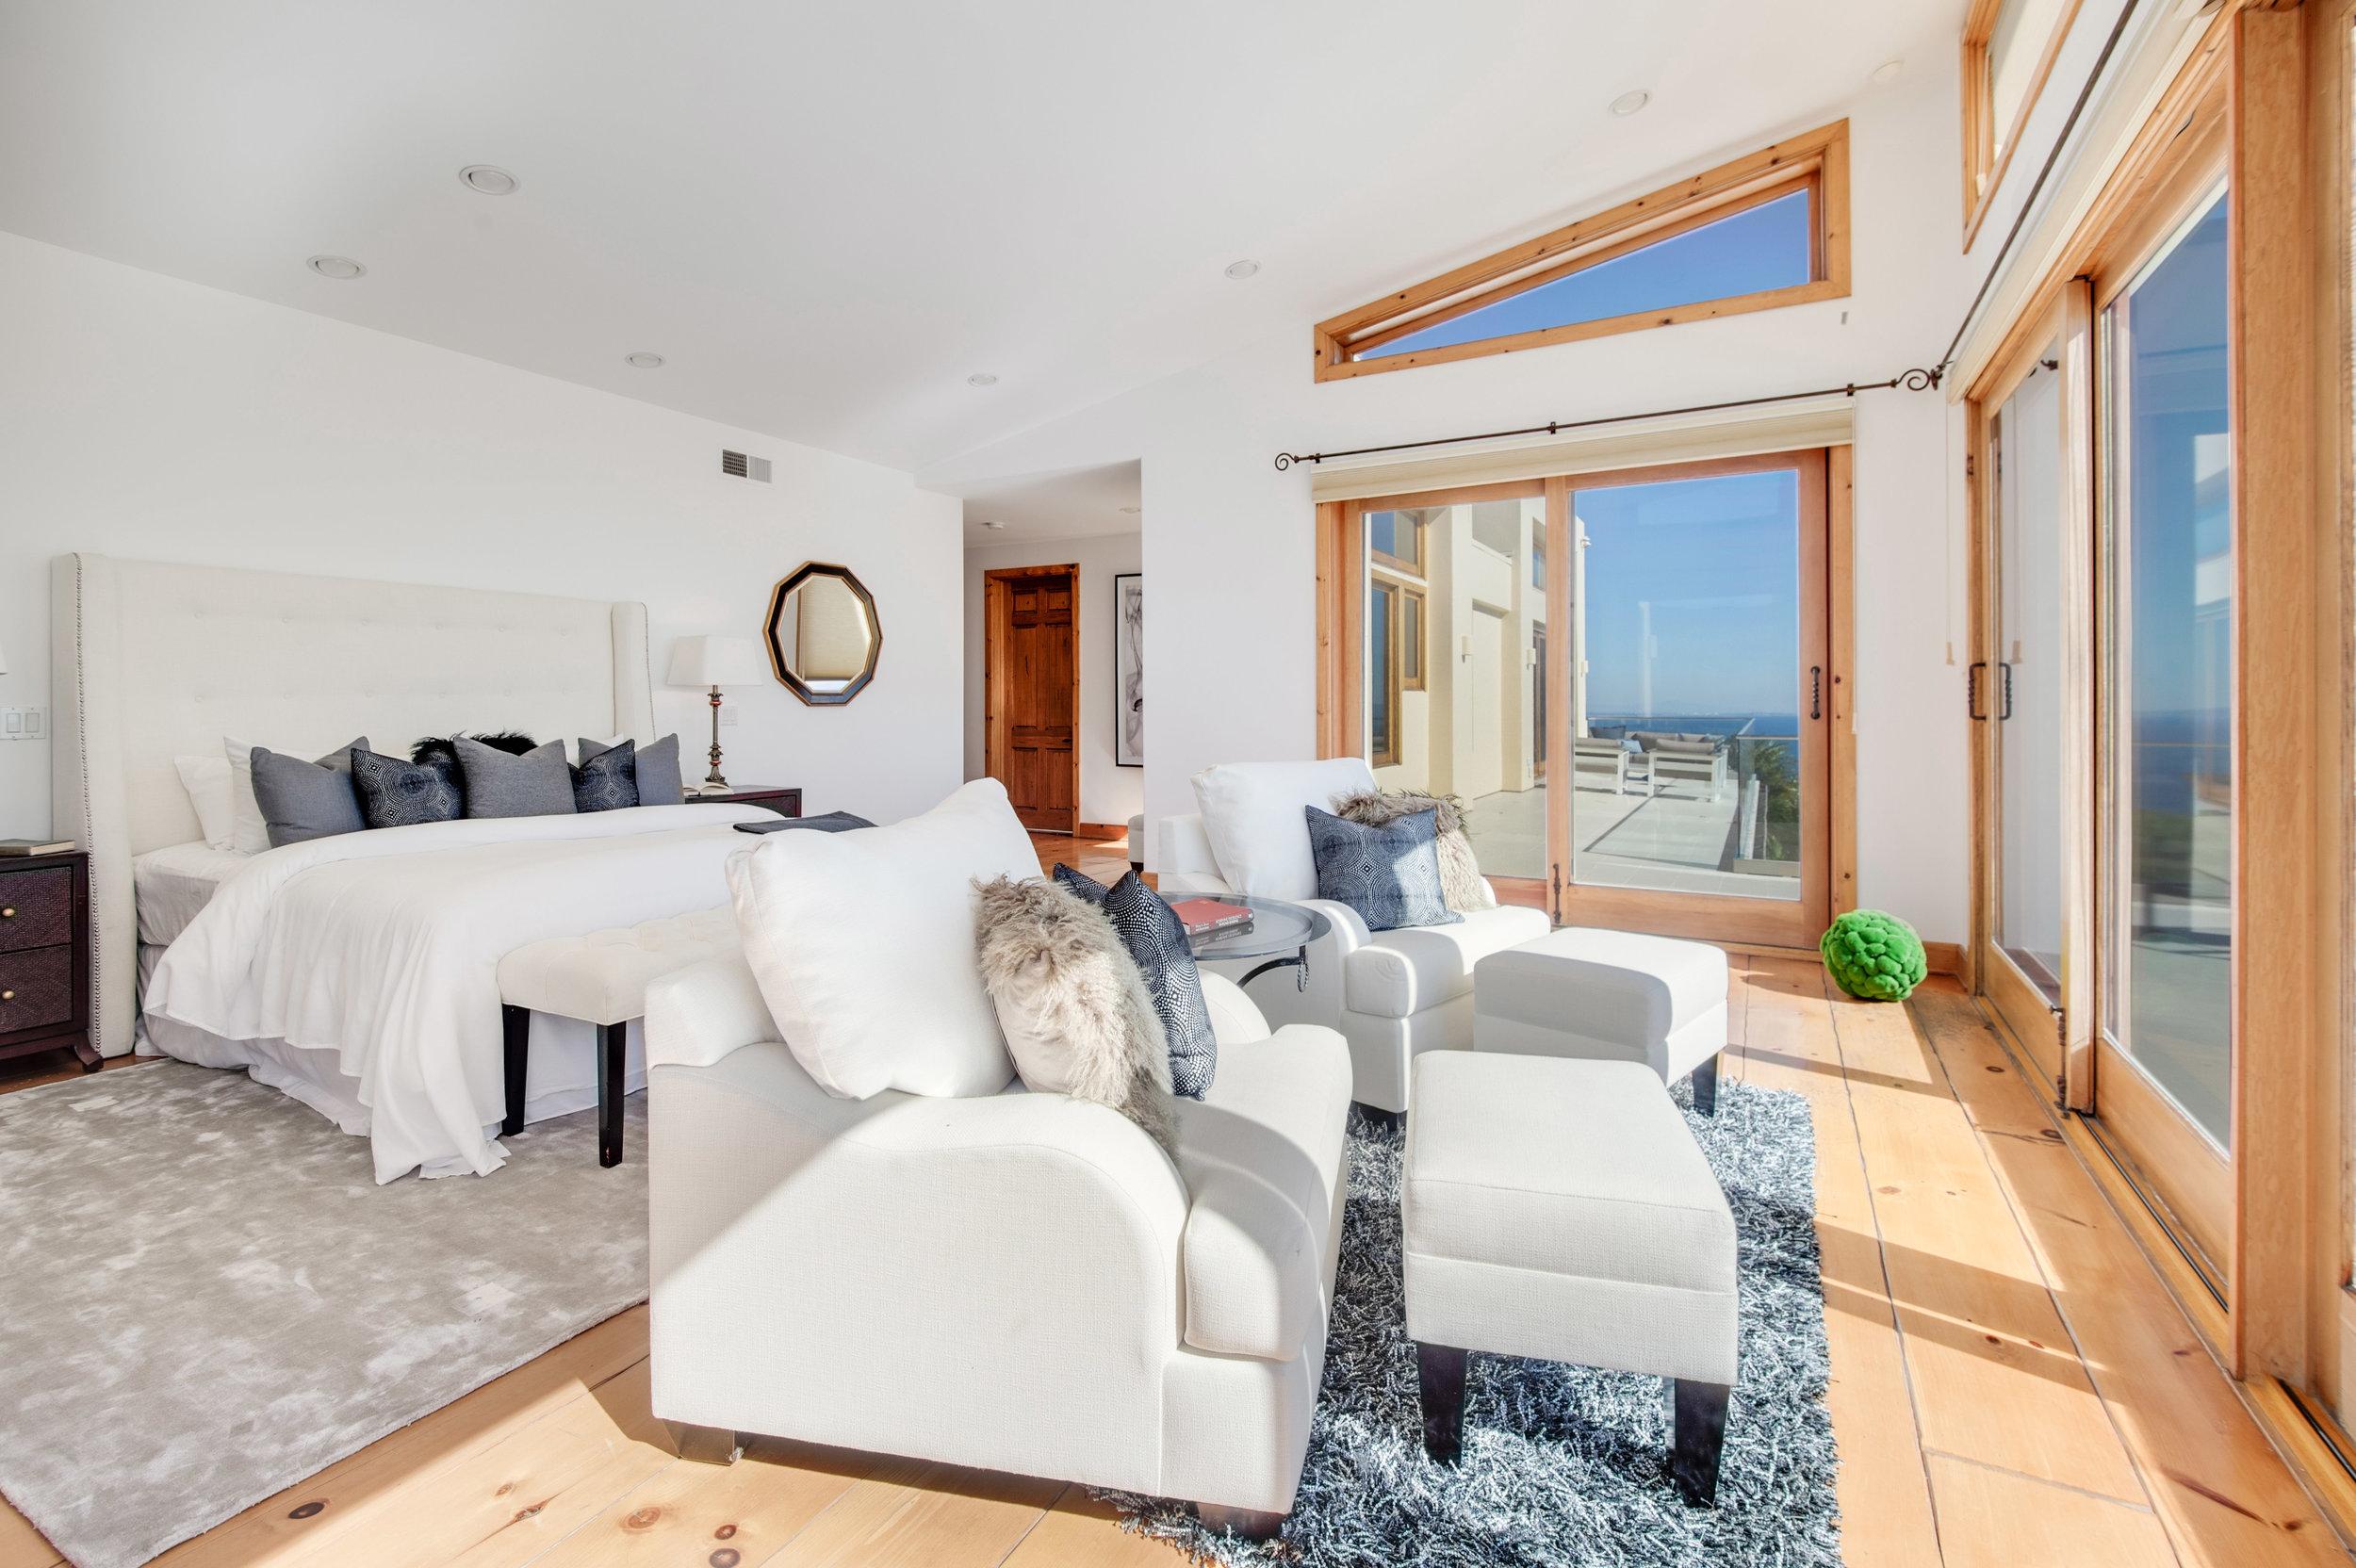 016 Master Bedroom 27475 Latigo Bay View Drive For Sale Lease The Malibu Life Team Luxury Real Estate.jpg